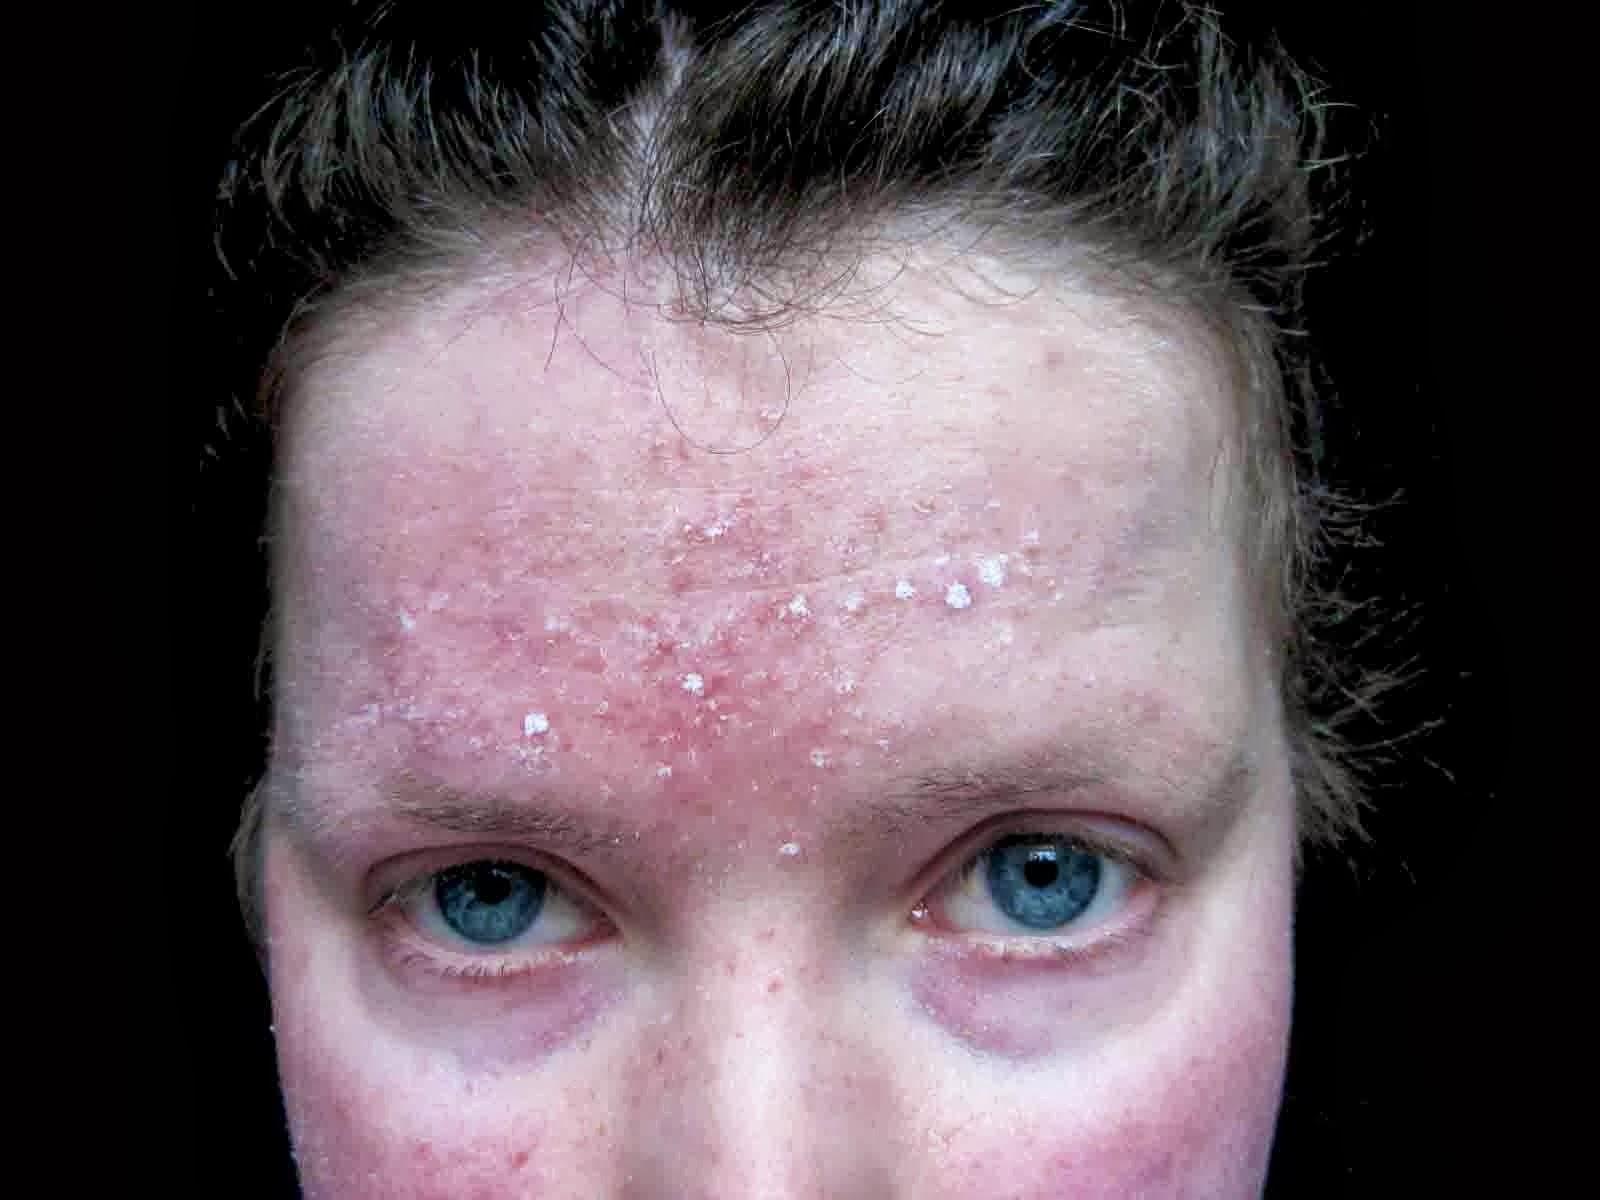 Metronidazole For Face Rash